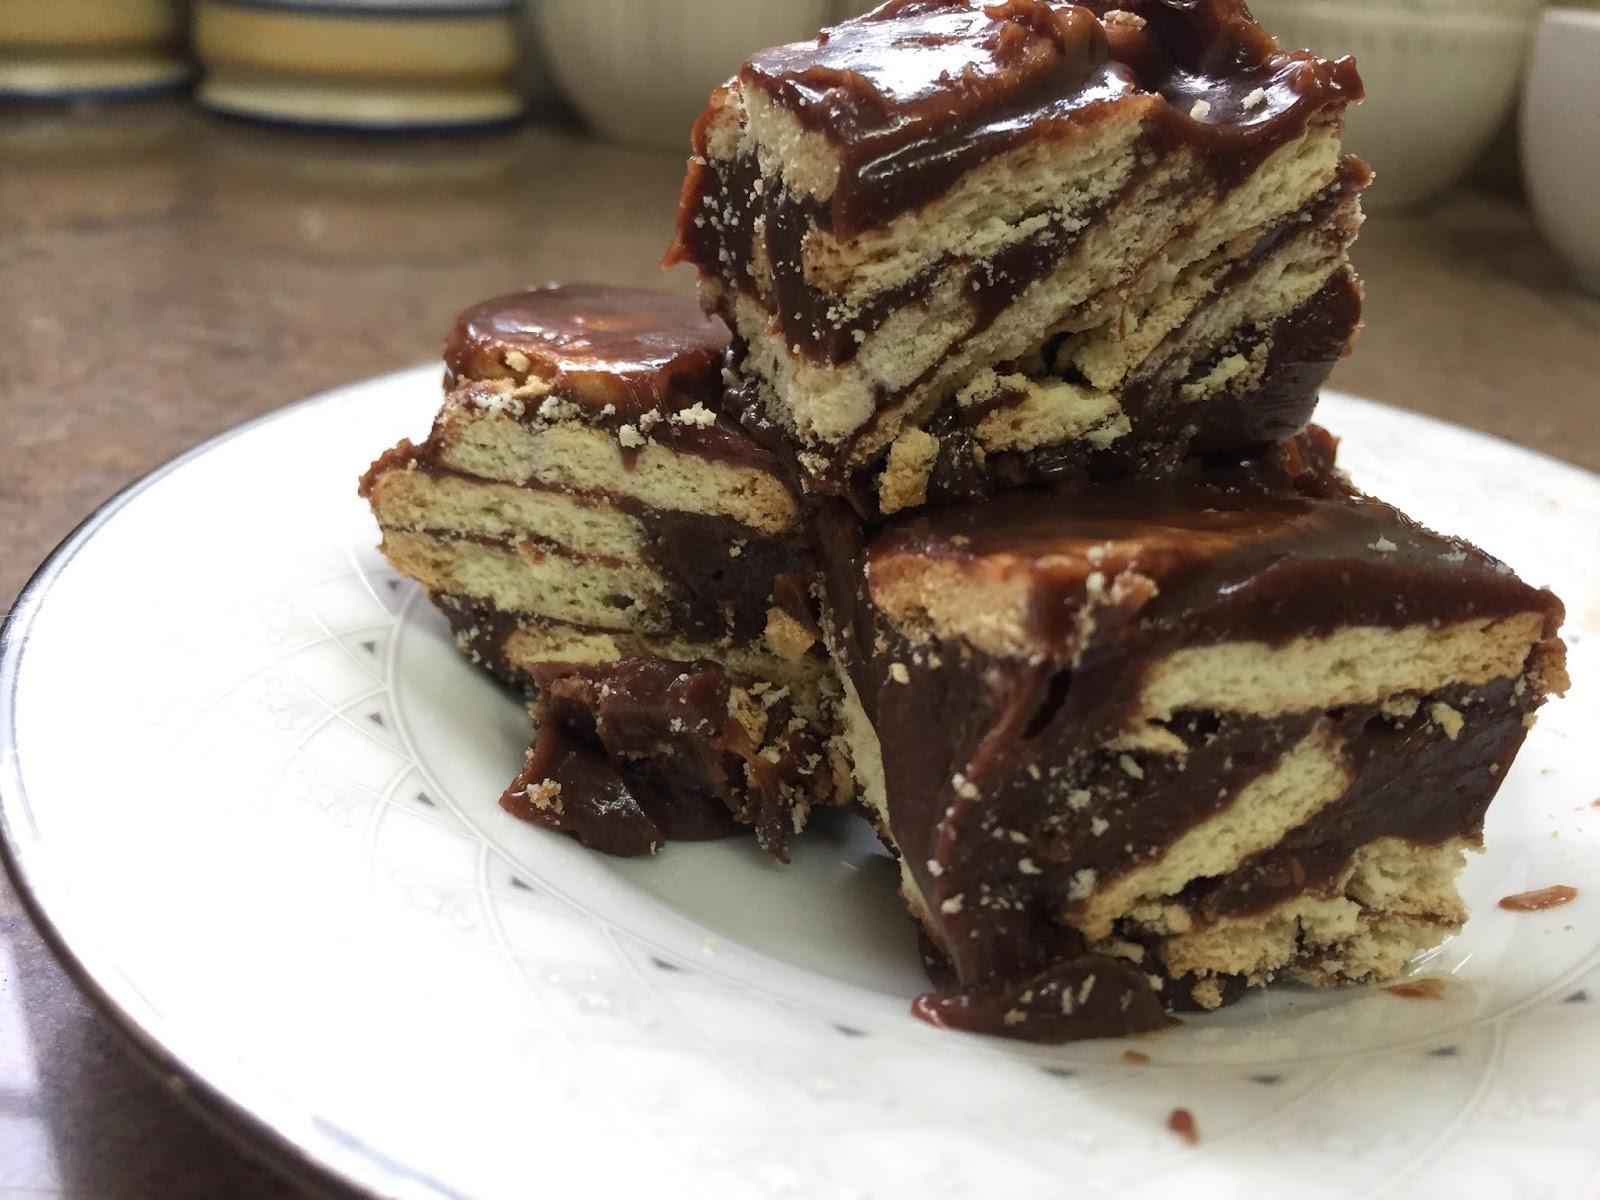 kek mudah disediakan, kek 4 bahan, kek batik sedap, resepi kek mudah